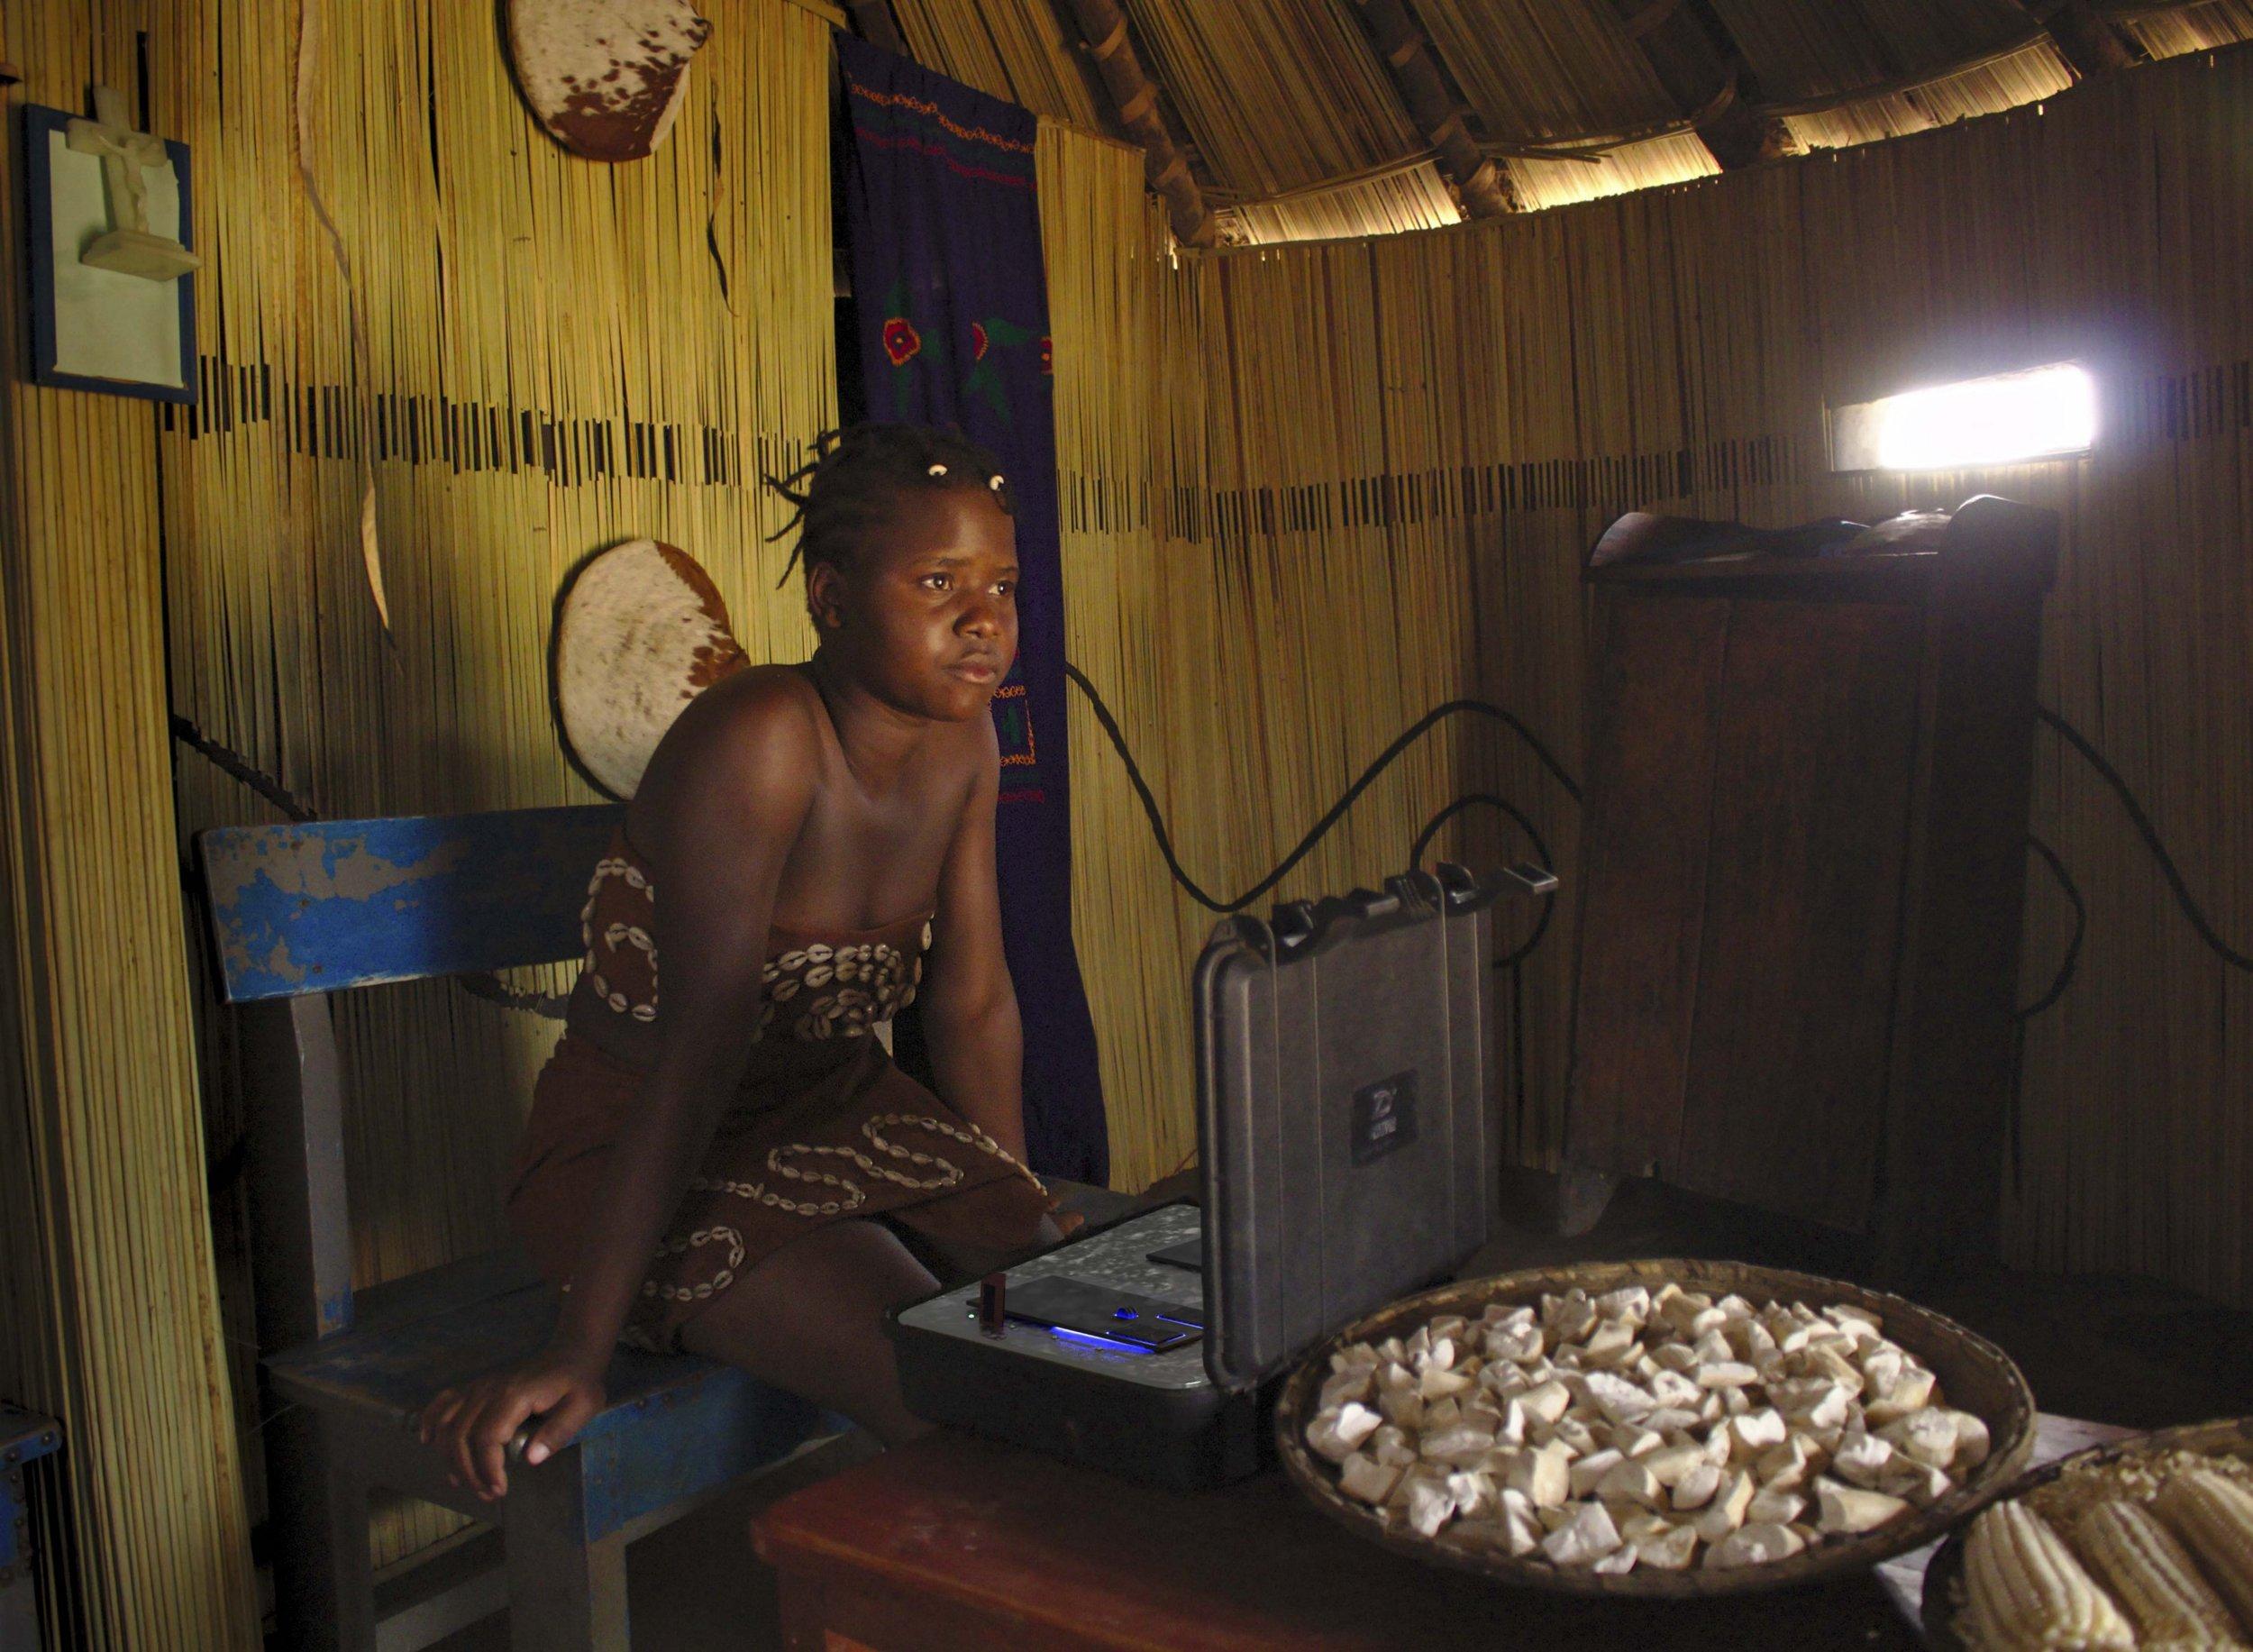 Still from Dilman's Dila movie 'Akoota'